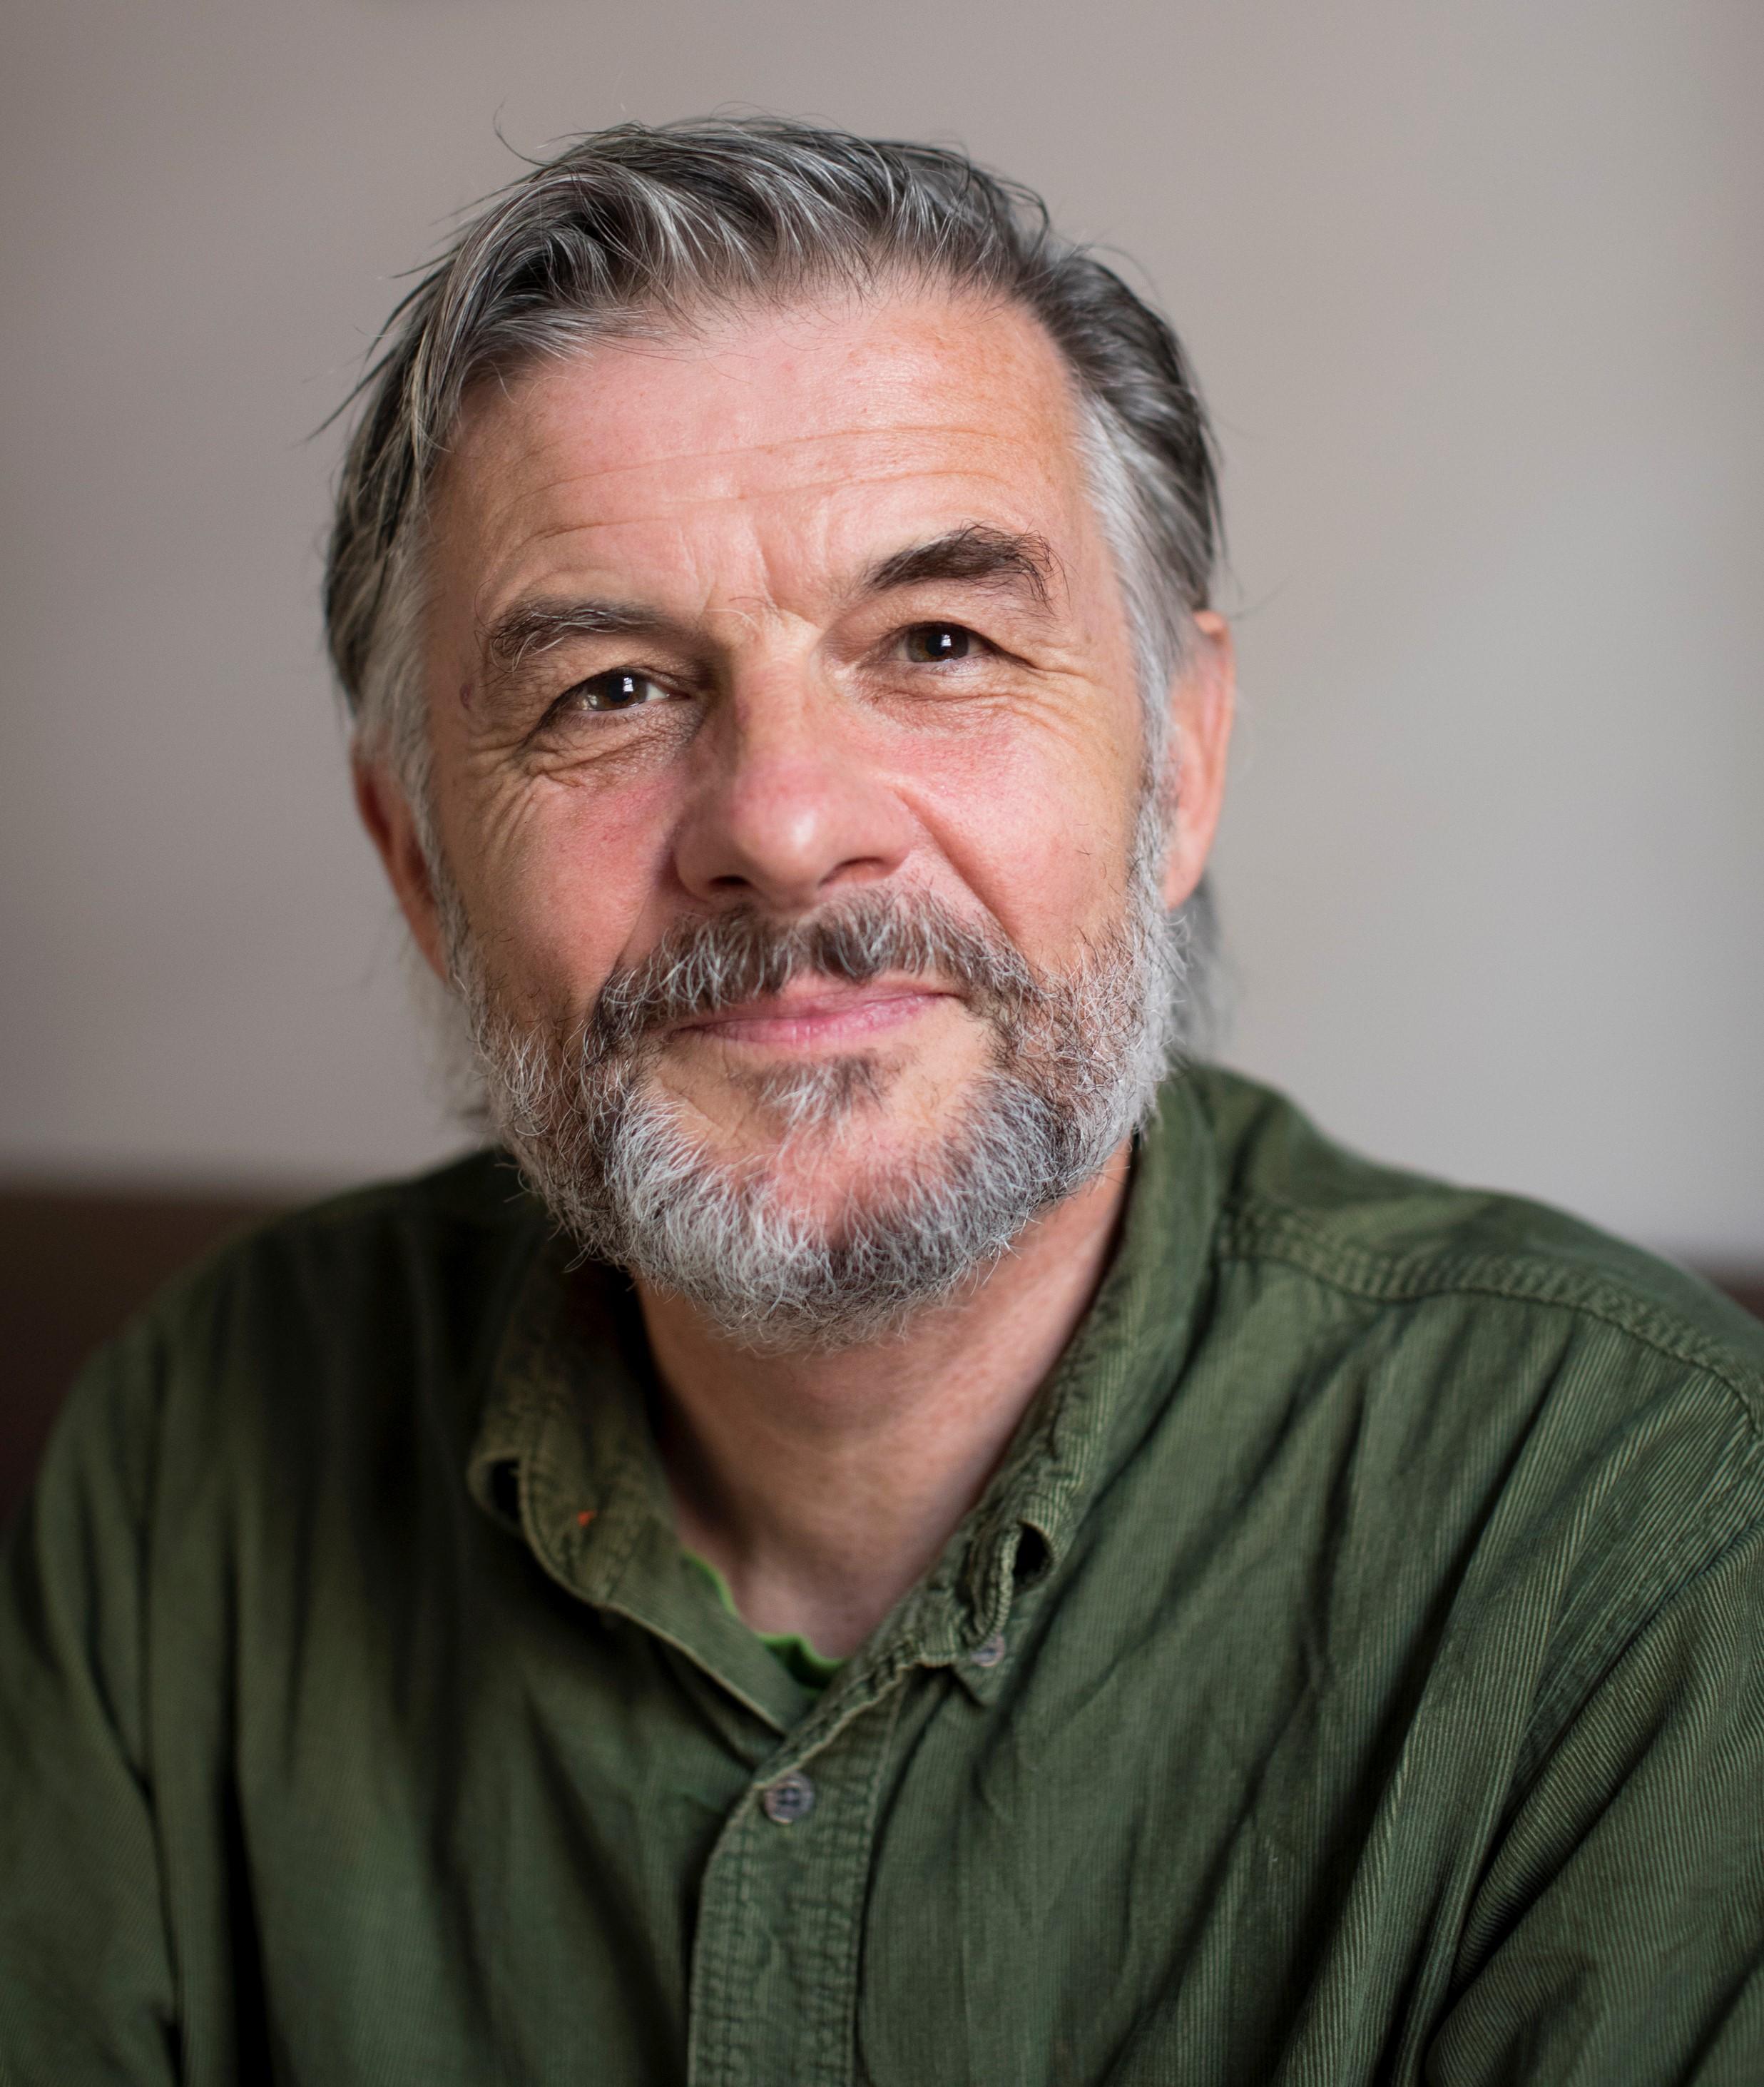 John Bisset-Smith